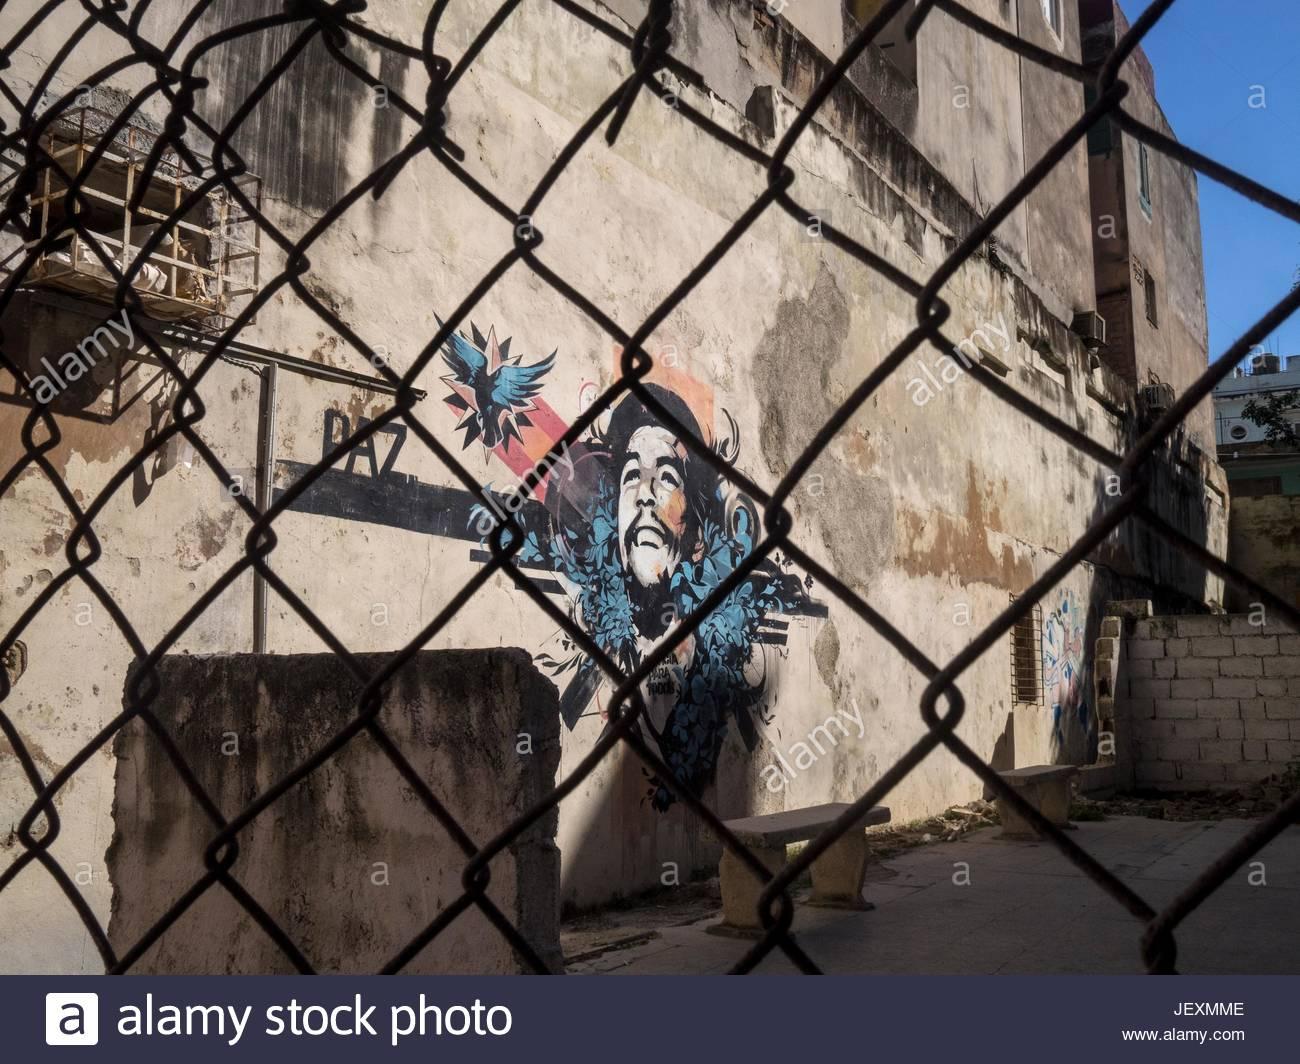 Che Guevara Graffiti hinter einem Draht Zaun in Calle Espada. Stockbild